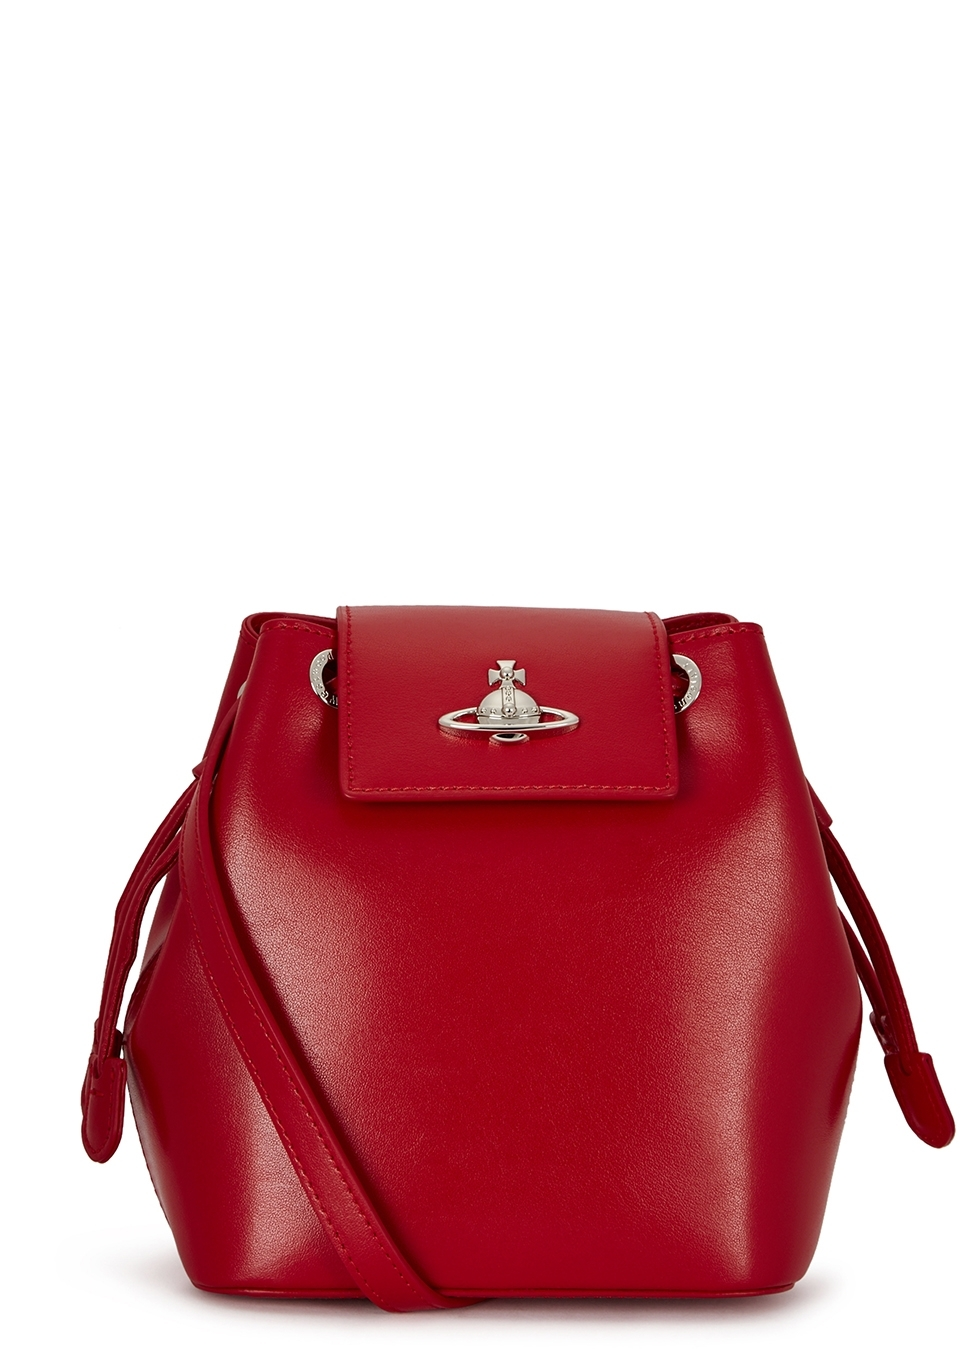 87b697dda8c7 Women s Designer Bags